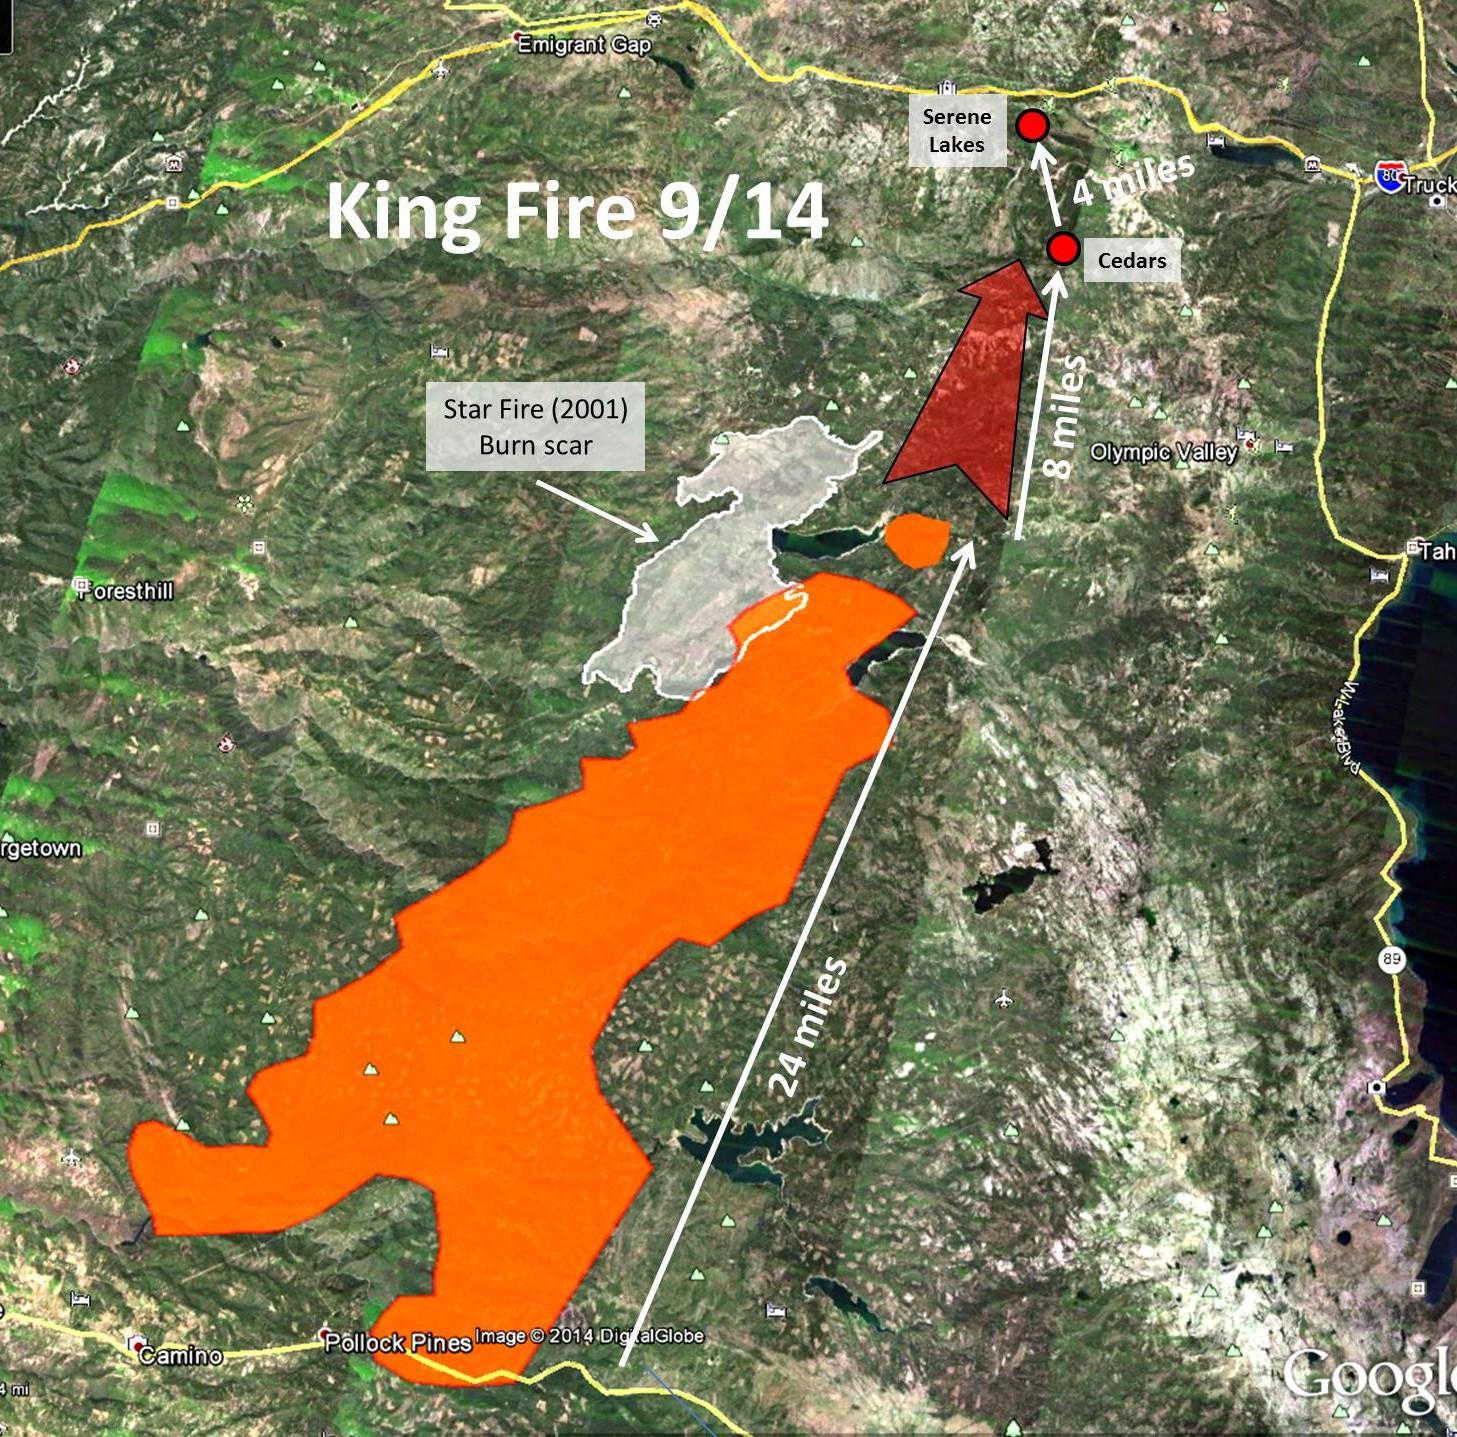 Kingfiremap